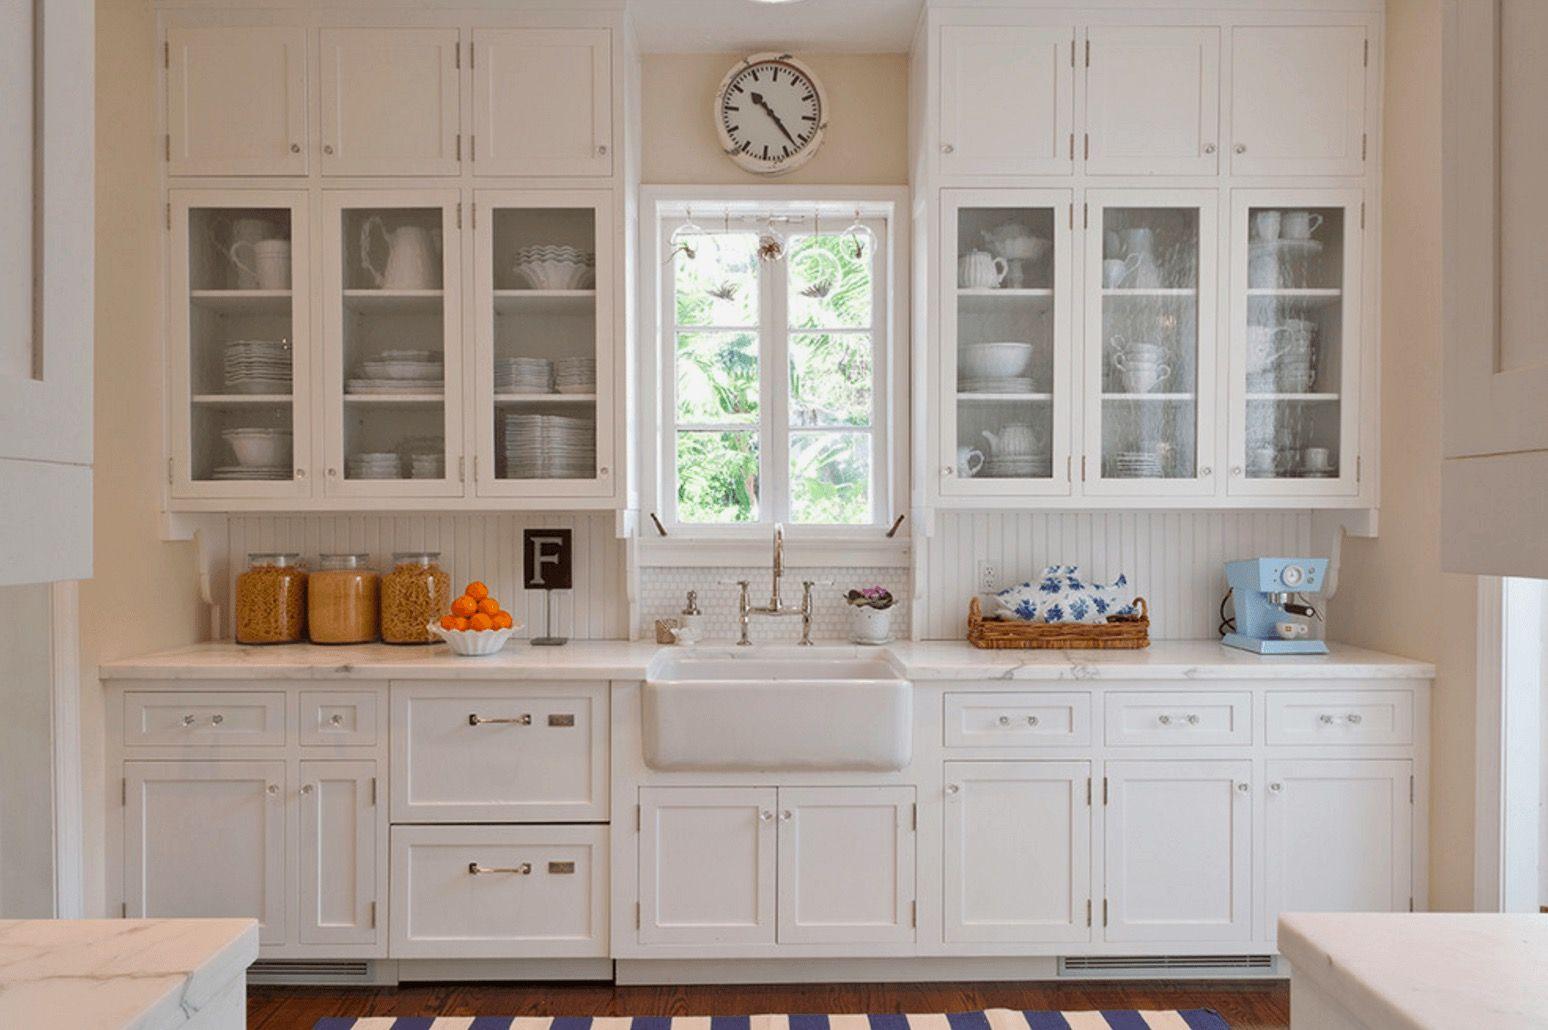 Backsplash Details Seeded Glass In Doors Perfect Hardware Glass Kitchen Cabinet Doors Glass Kitchen Cabinets Beautiful Kitchen Cabinets